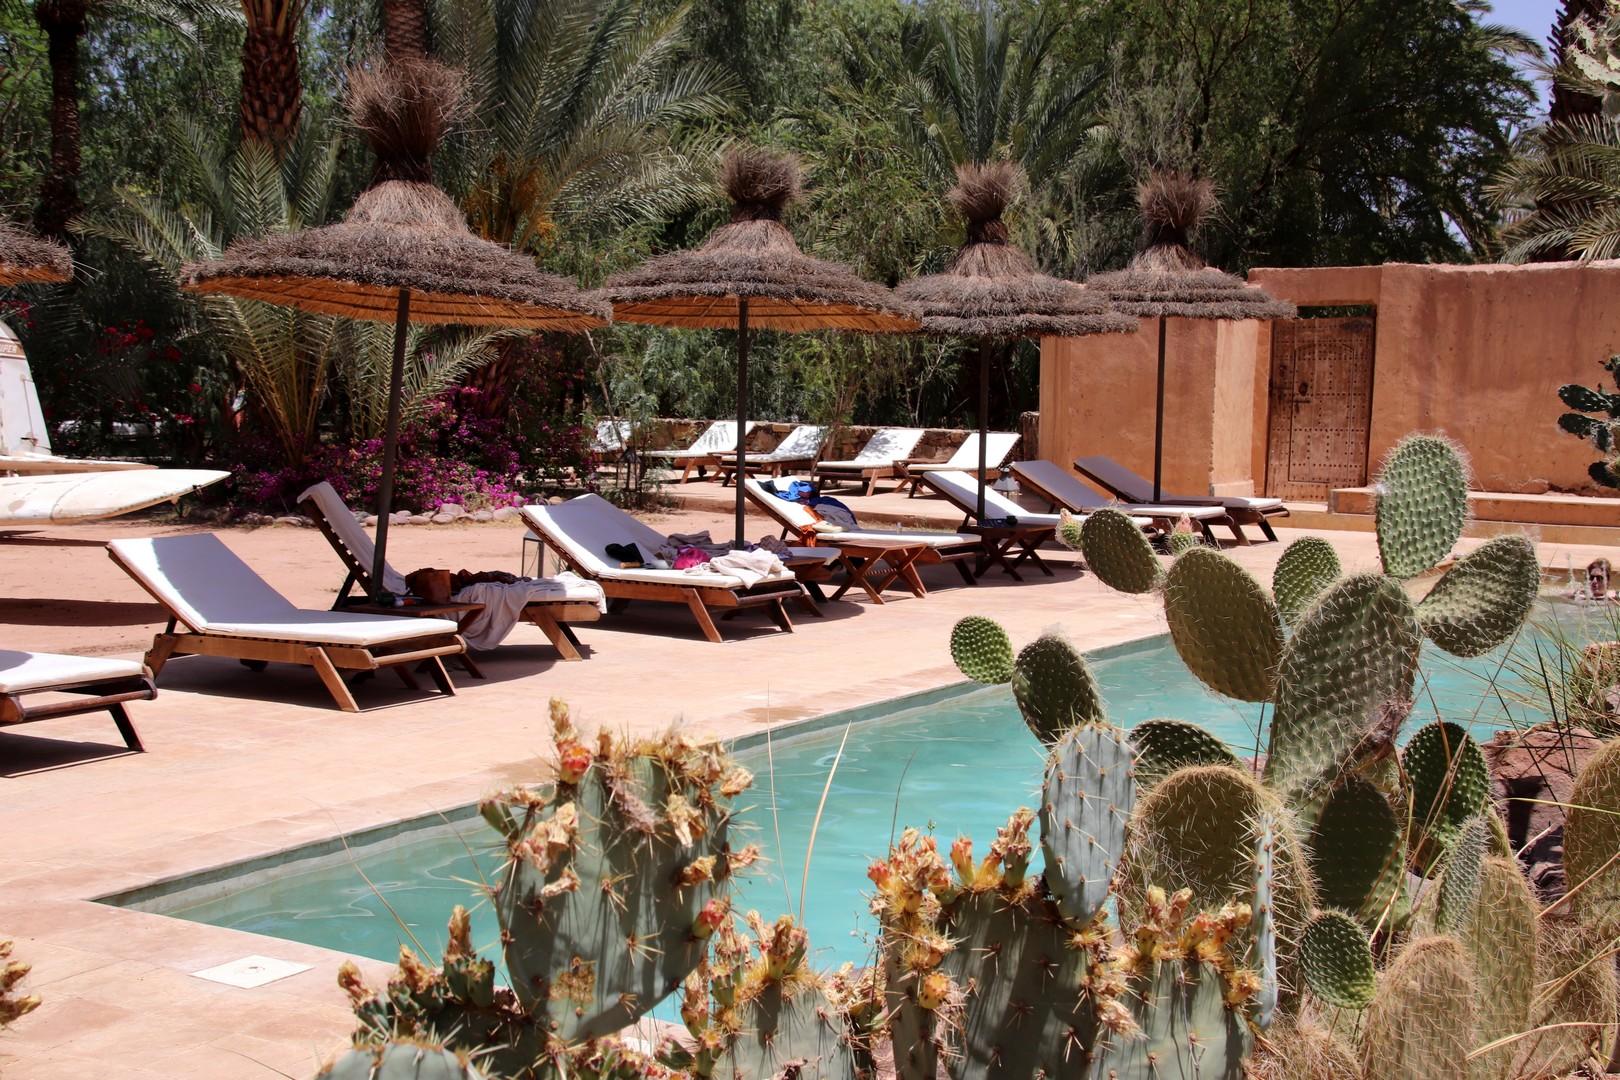 Maroc - Piscine et transats à l'Azalai Desert Lodge à Zagora